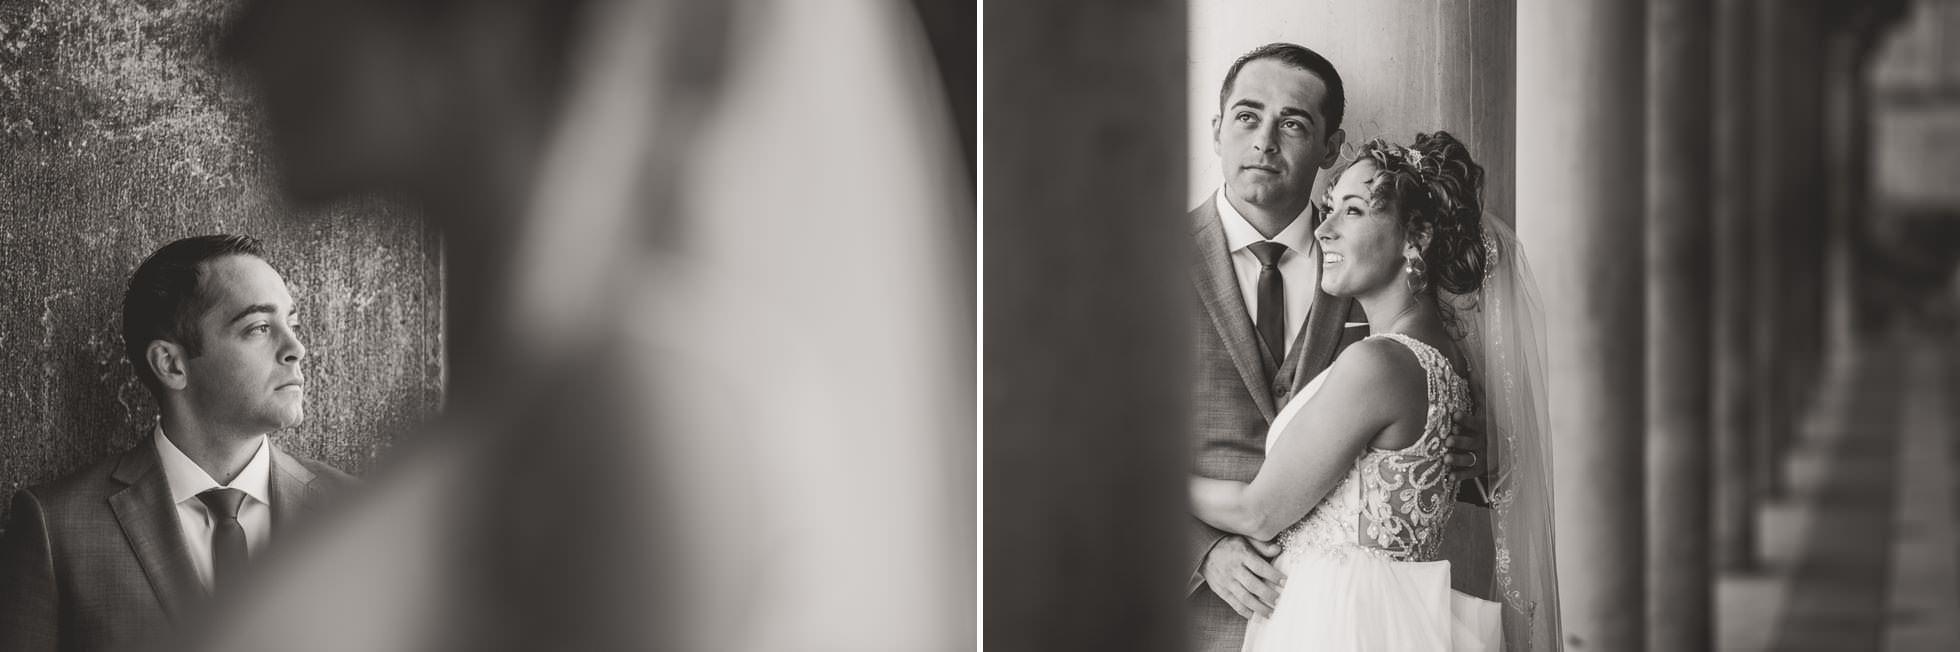 Fotografo matrimonio venezia san marco